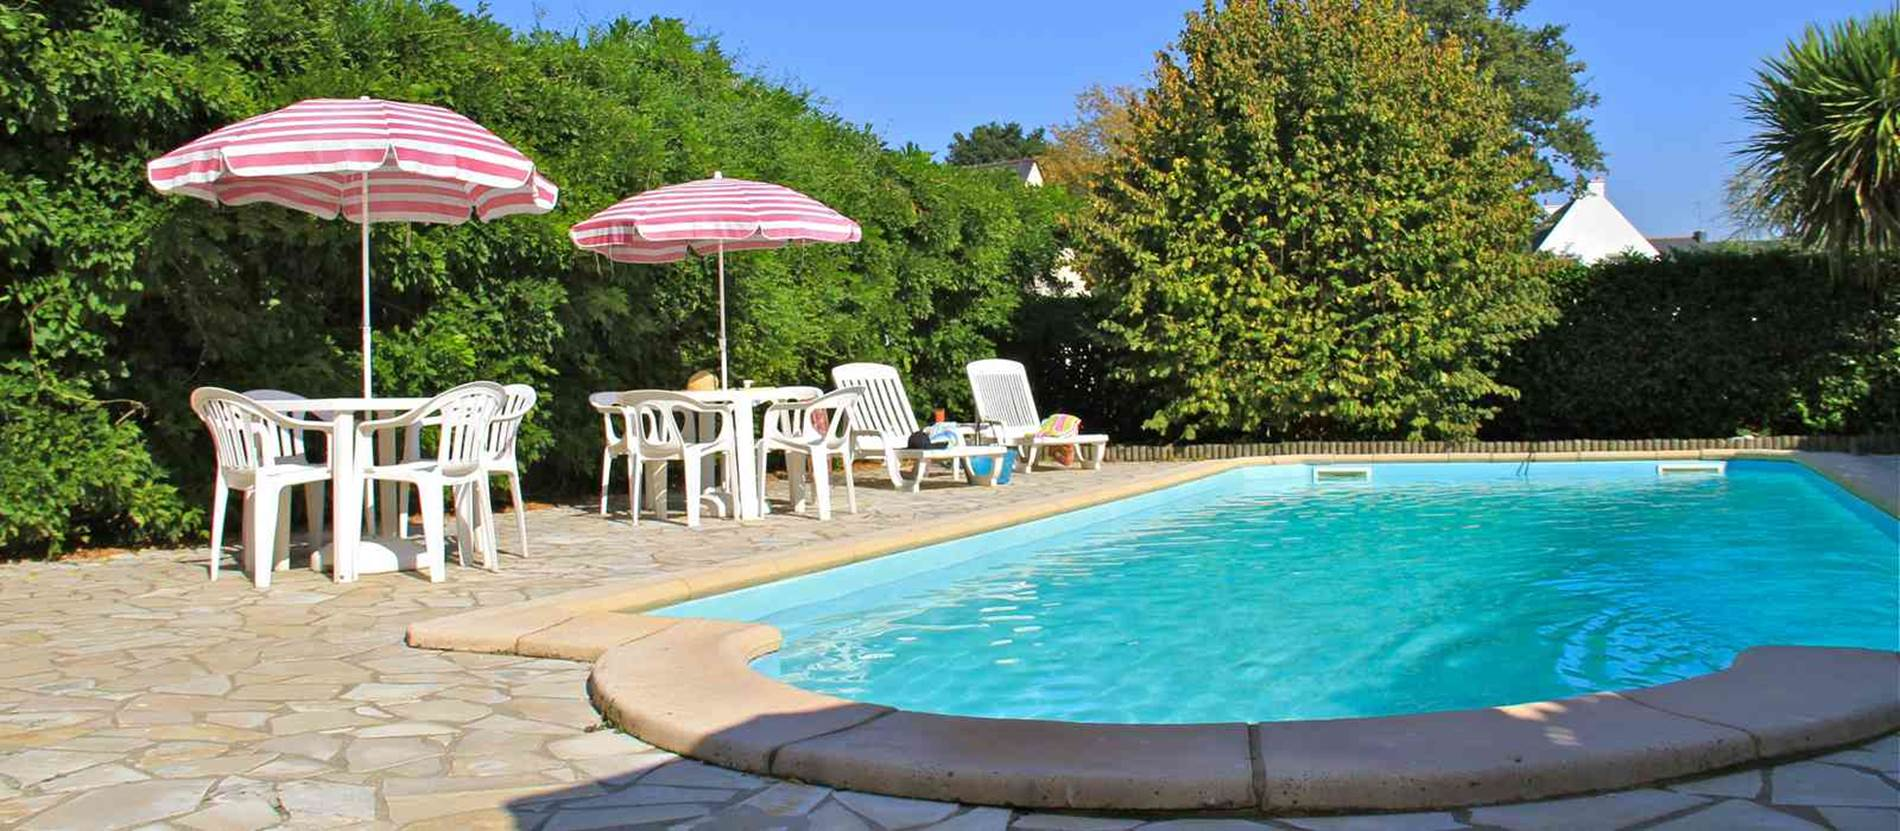 hotel-logis-letylann-saintave-morbihan-bretagne-sud © hotel-logis-letylann-saintave